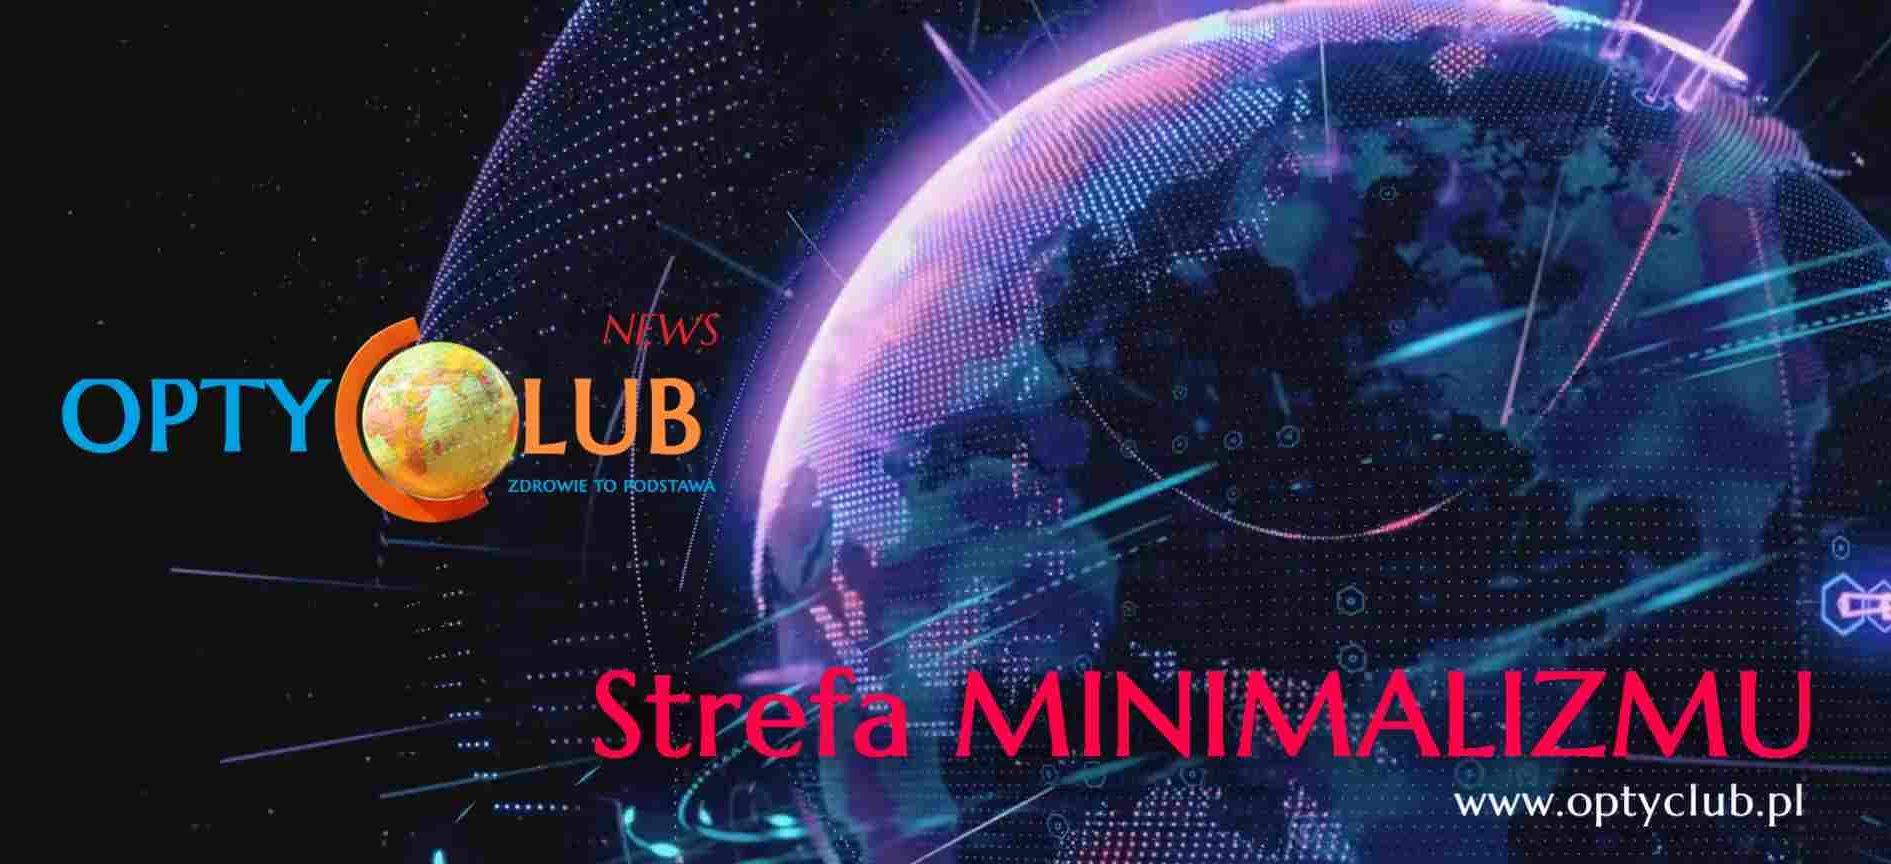 https://optyclub.pl/wp-content/uploads/2018/09/Strefa-Minimalizmu2-e1537619698107.jpg